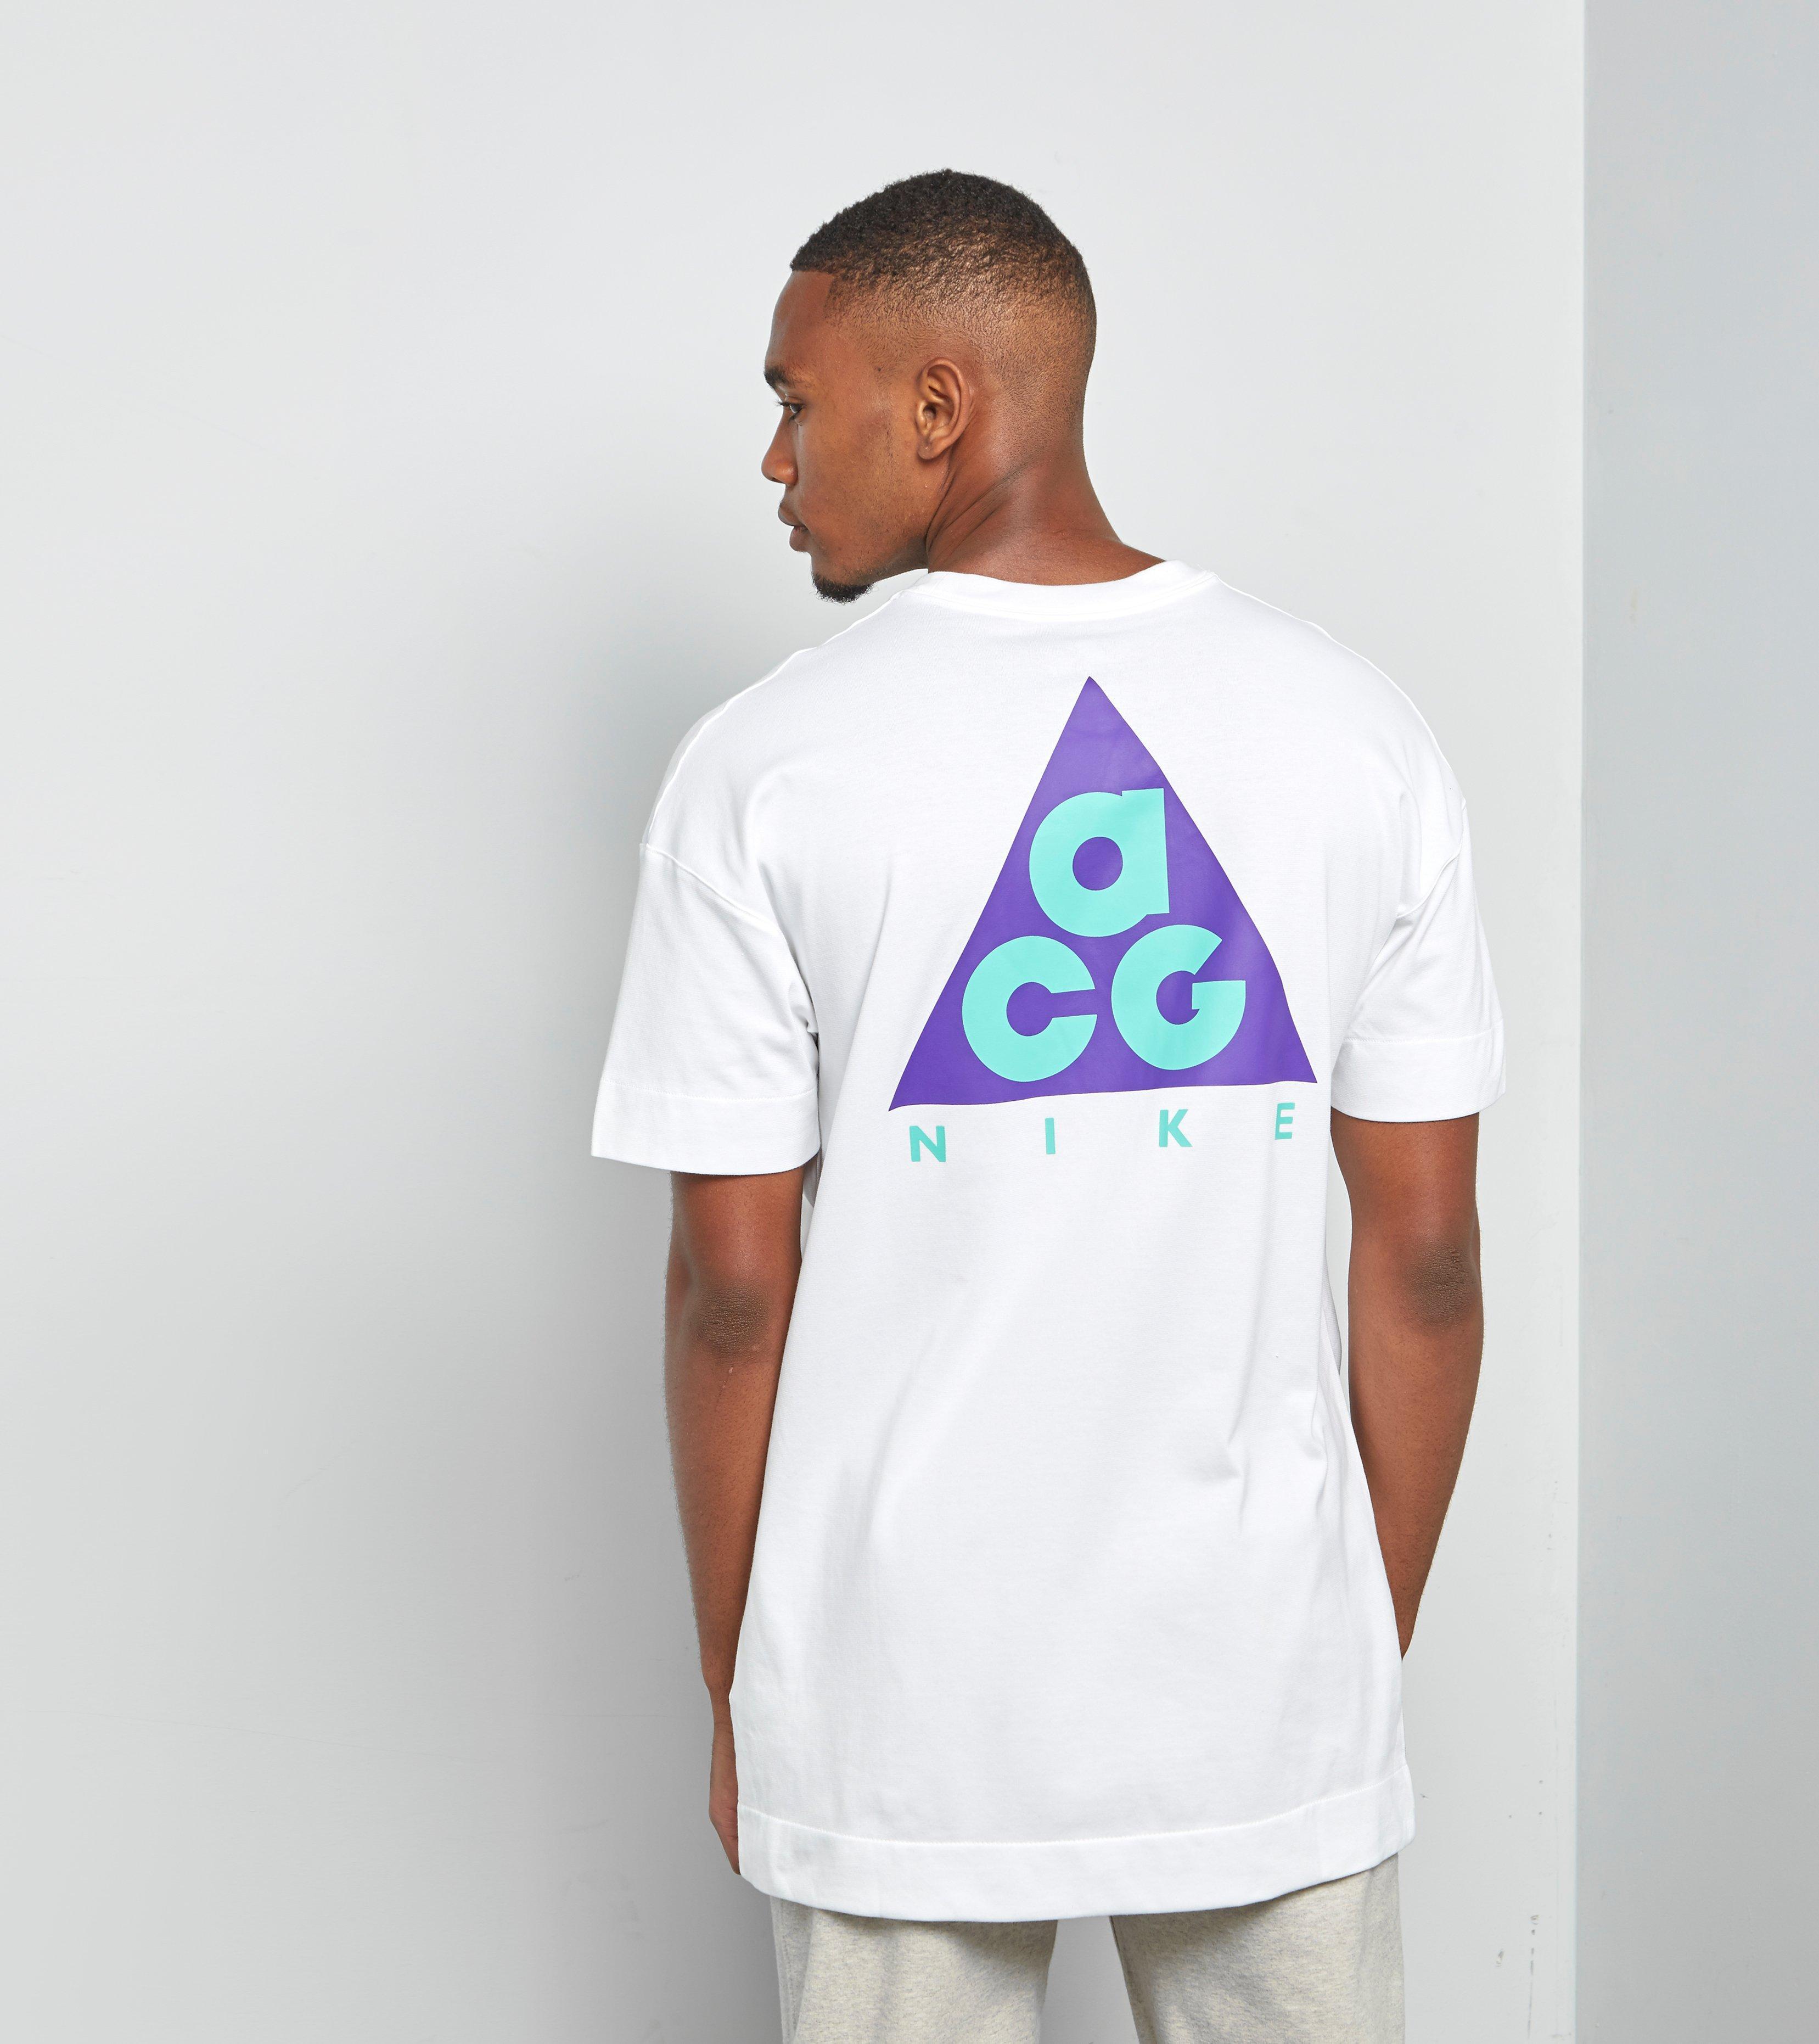 2018SS NIKE ACG Tee Nike ACG T shirt AO4644 451 color: NAVY size: XL